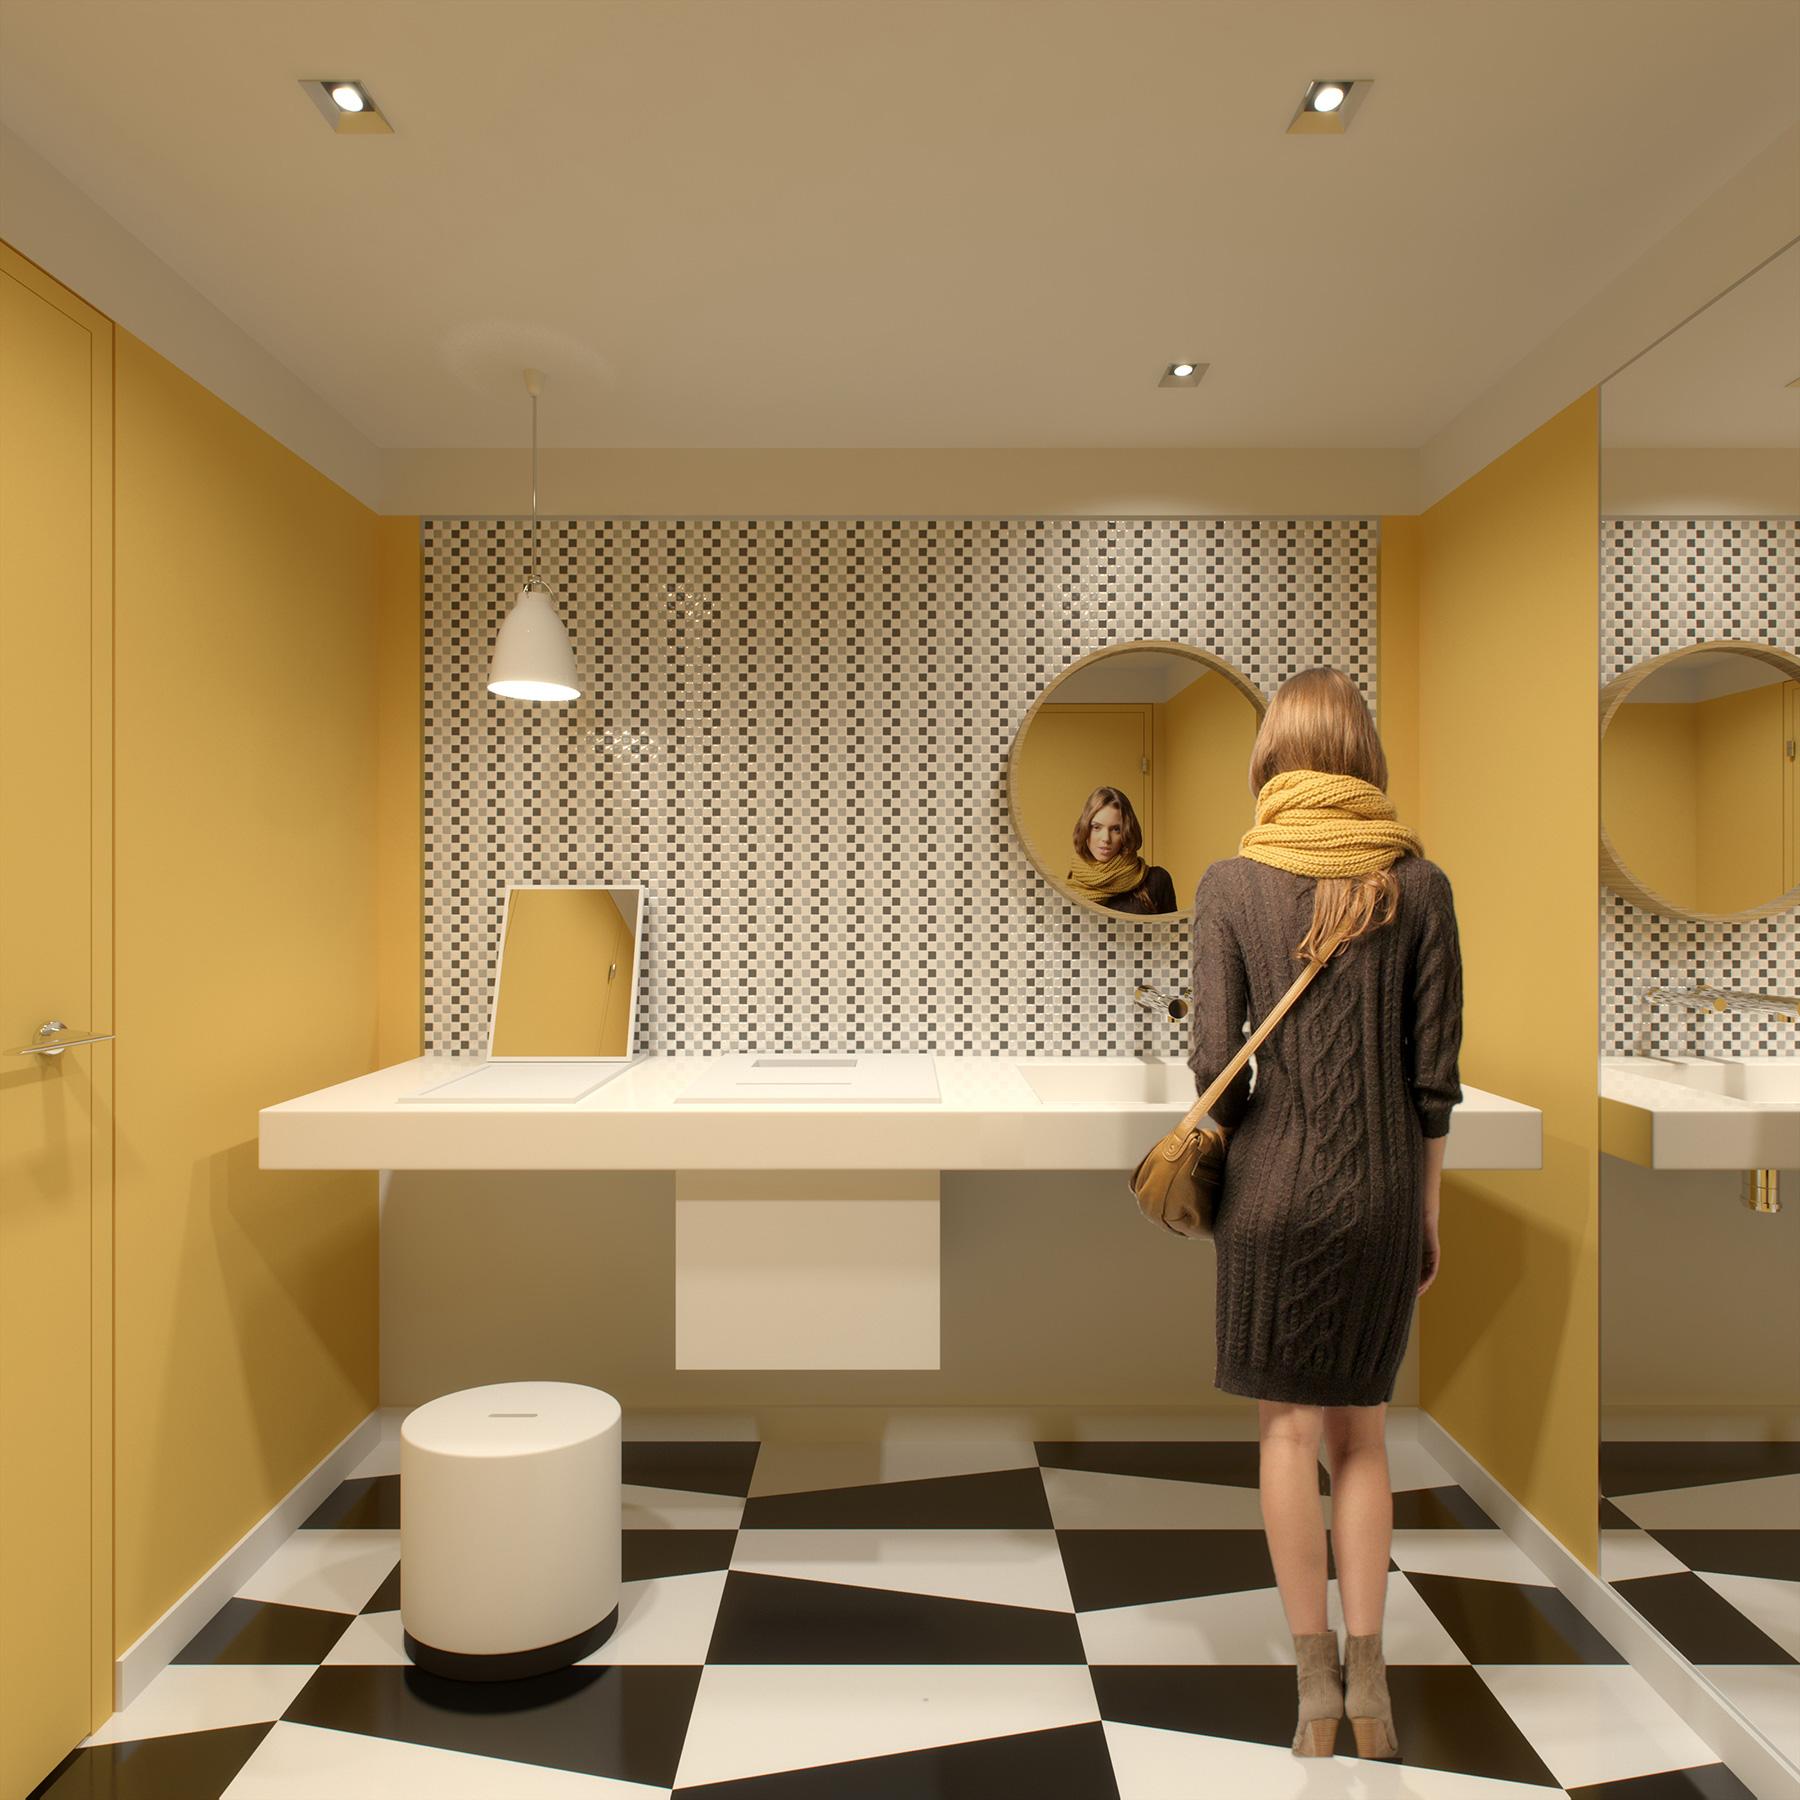 CarmineCrimson-Archviz-2014-ruedelille-sanitaire.jpg